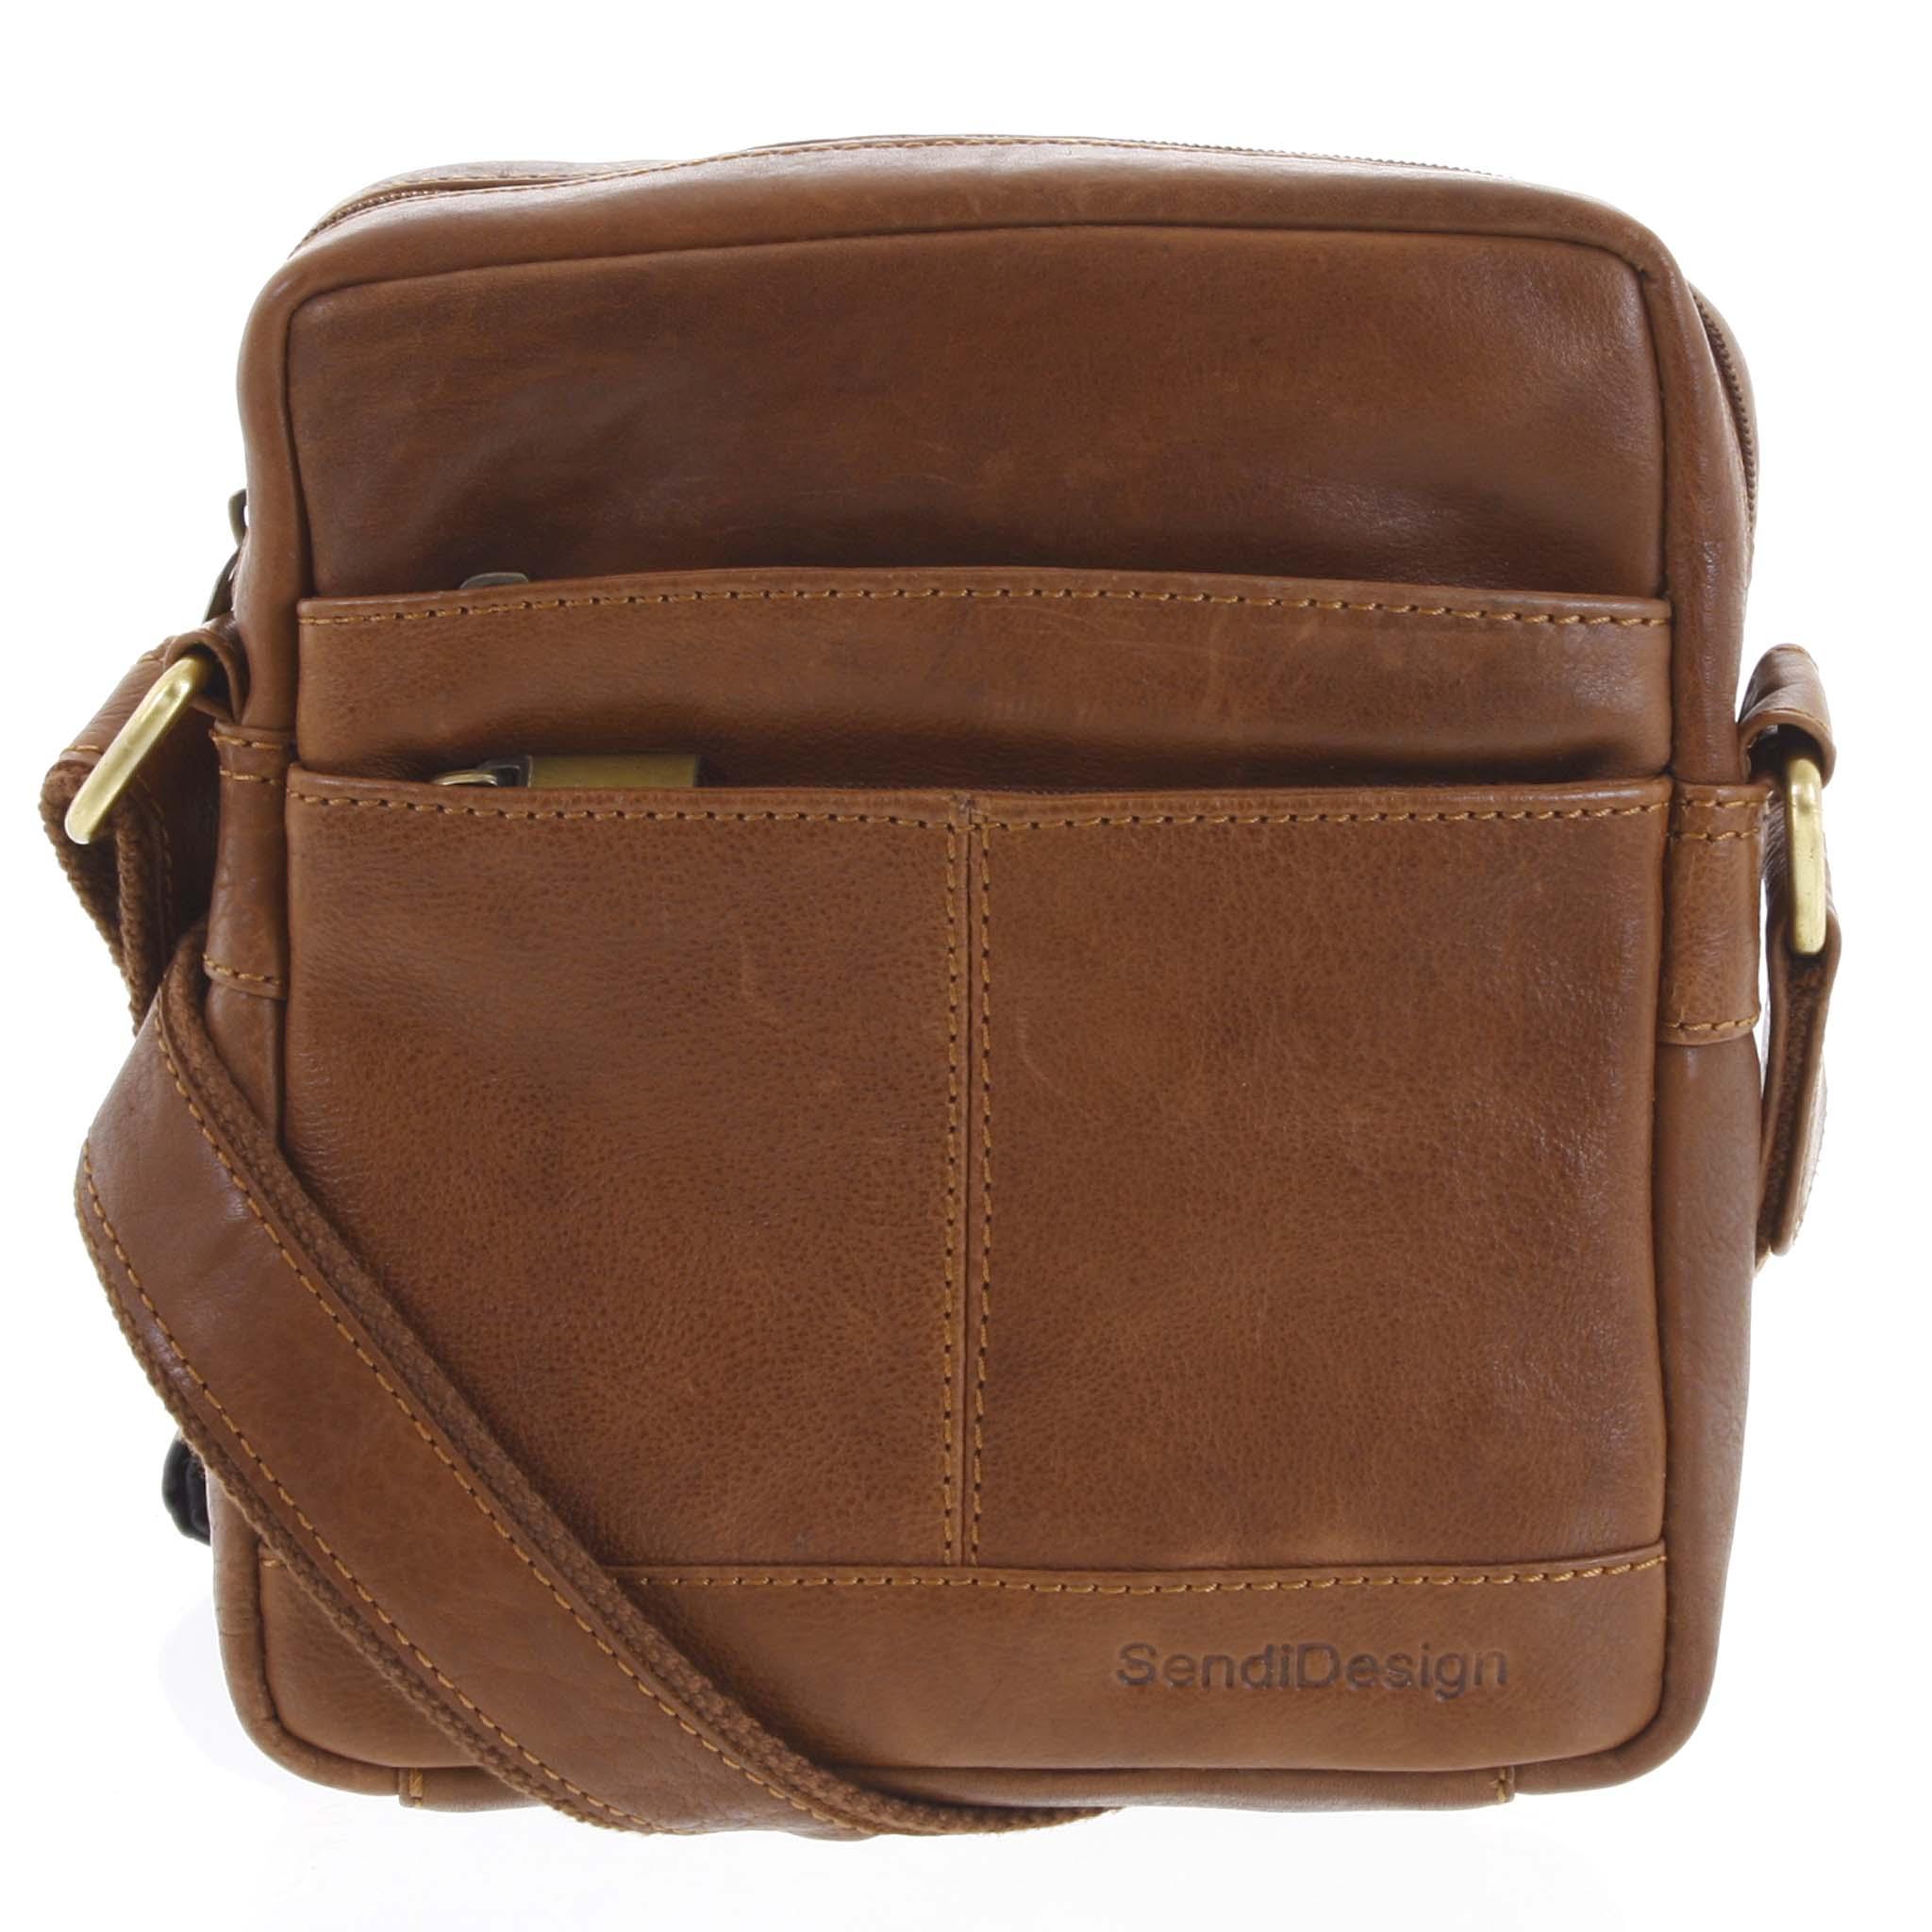 Pánská kožená taška hnědá - SendiDesign Shaper